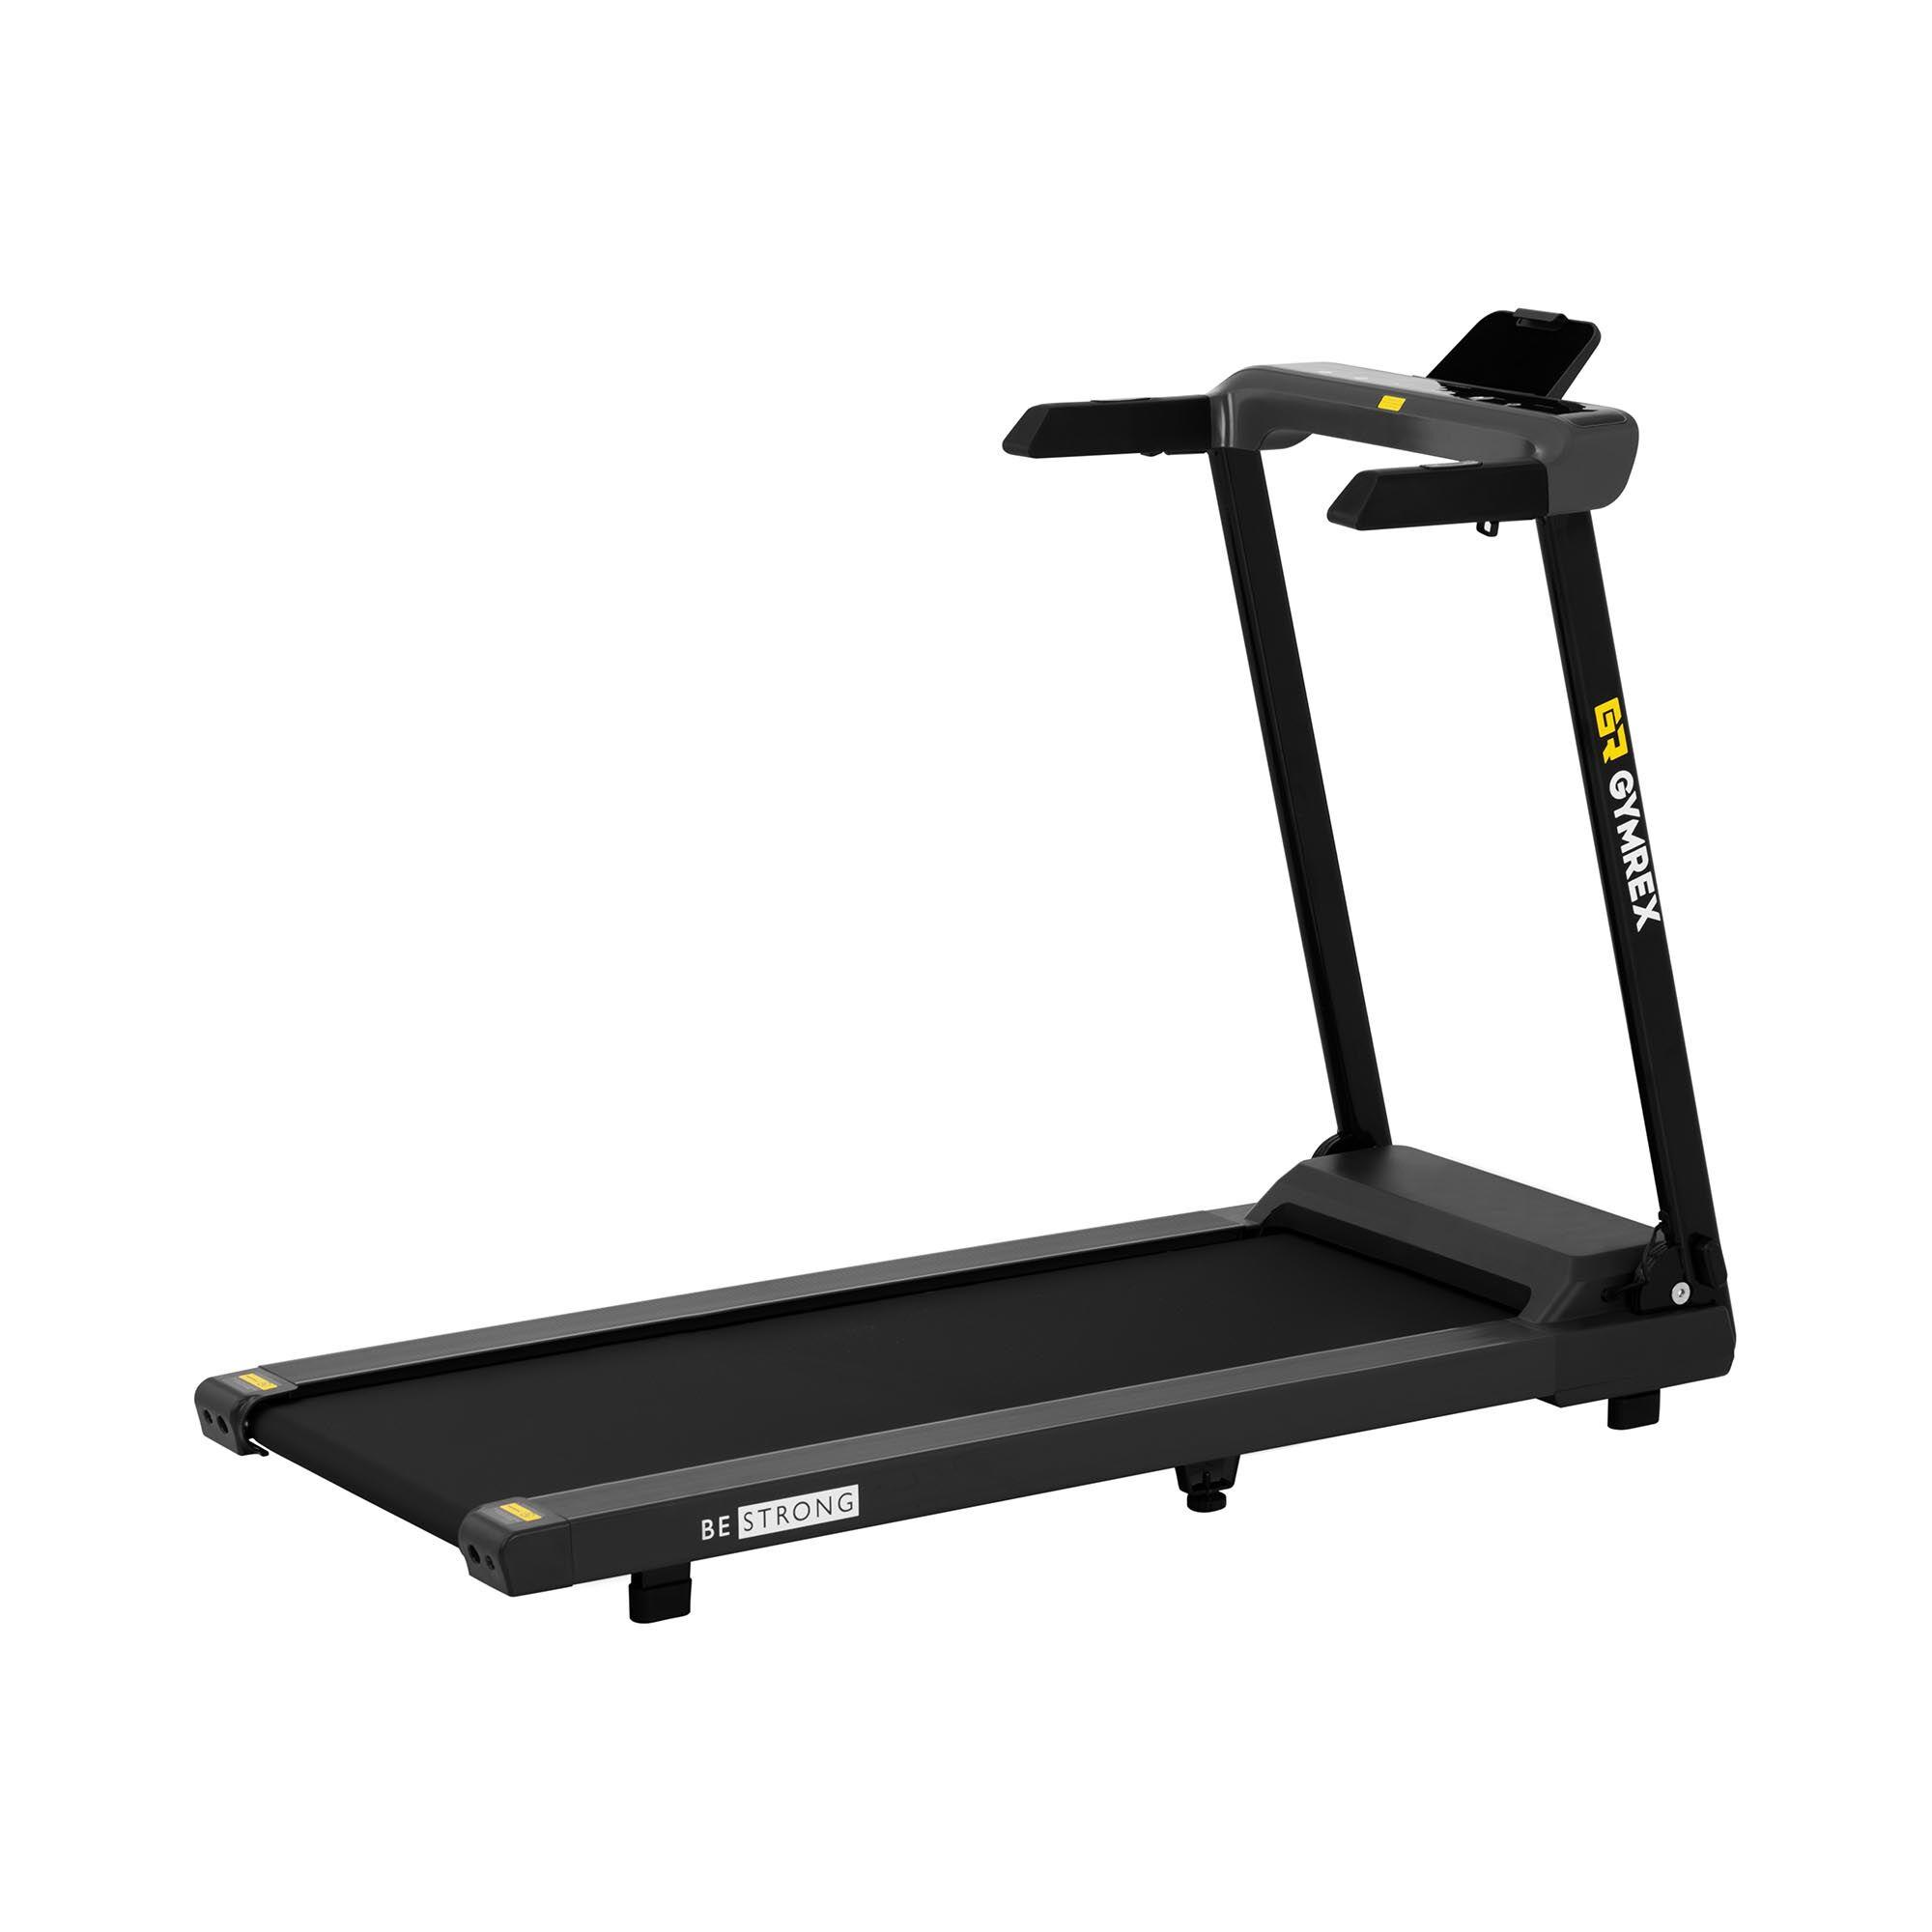 gymrex tapis roulant pieghevole - 1.200 w - da 1,5 a 10,2 km/h - 120 kg gr-hg12